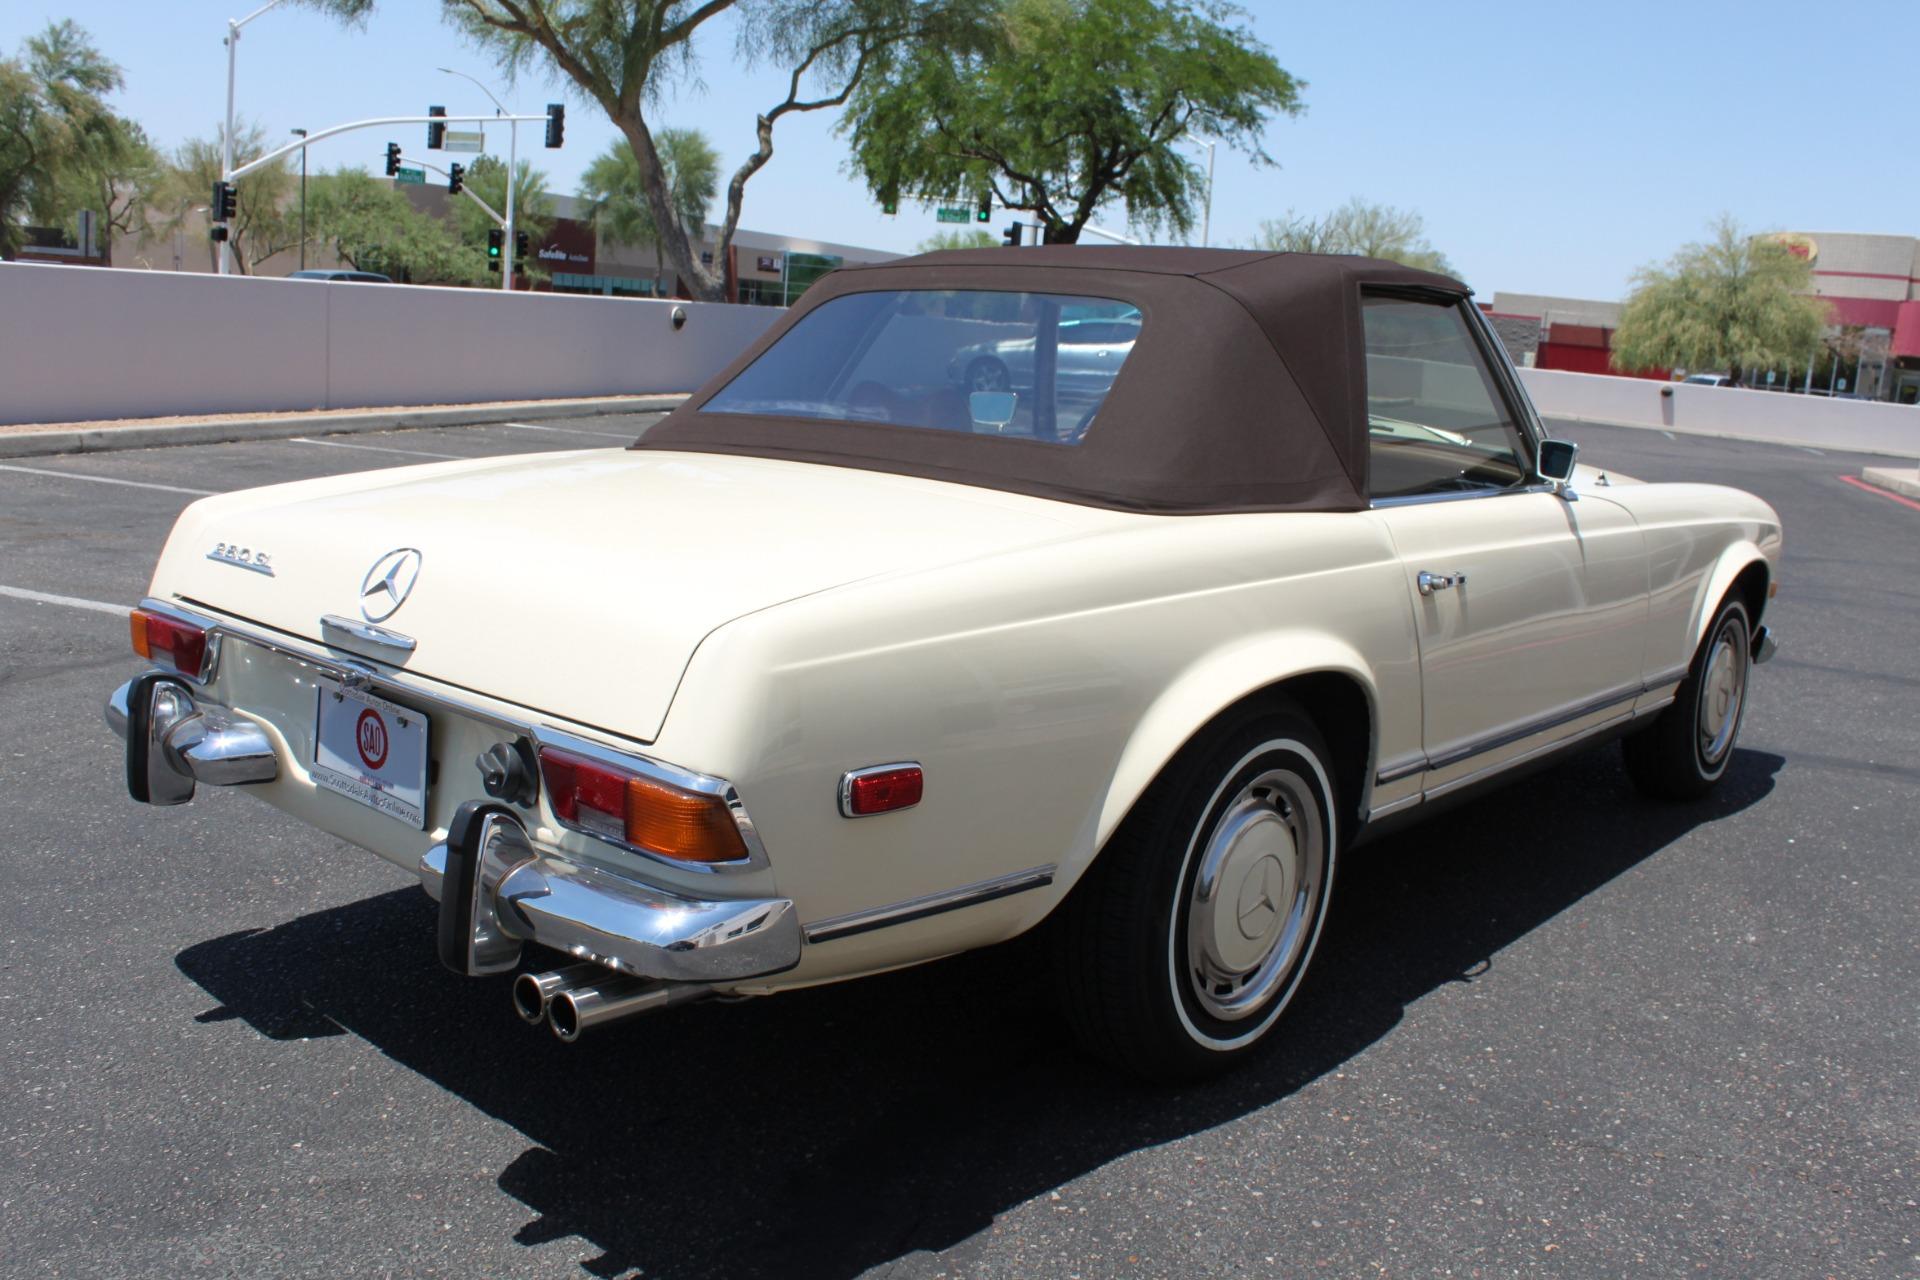 Used-1971-Mercedes-Benz-280SL-Convertible-Camaro